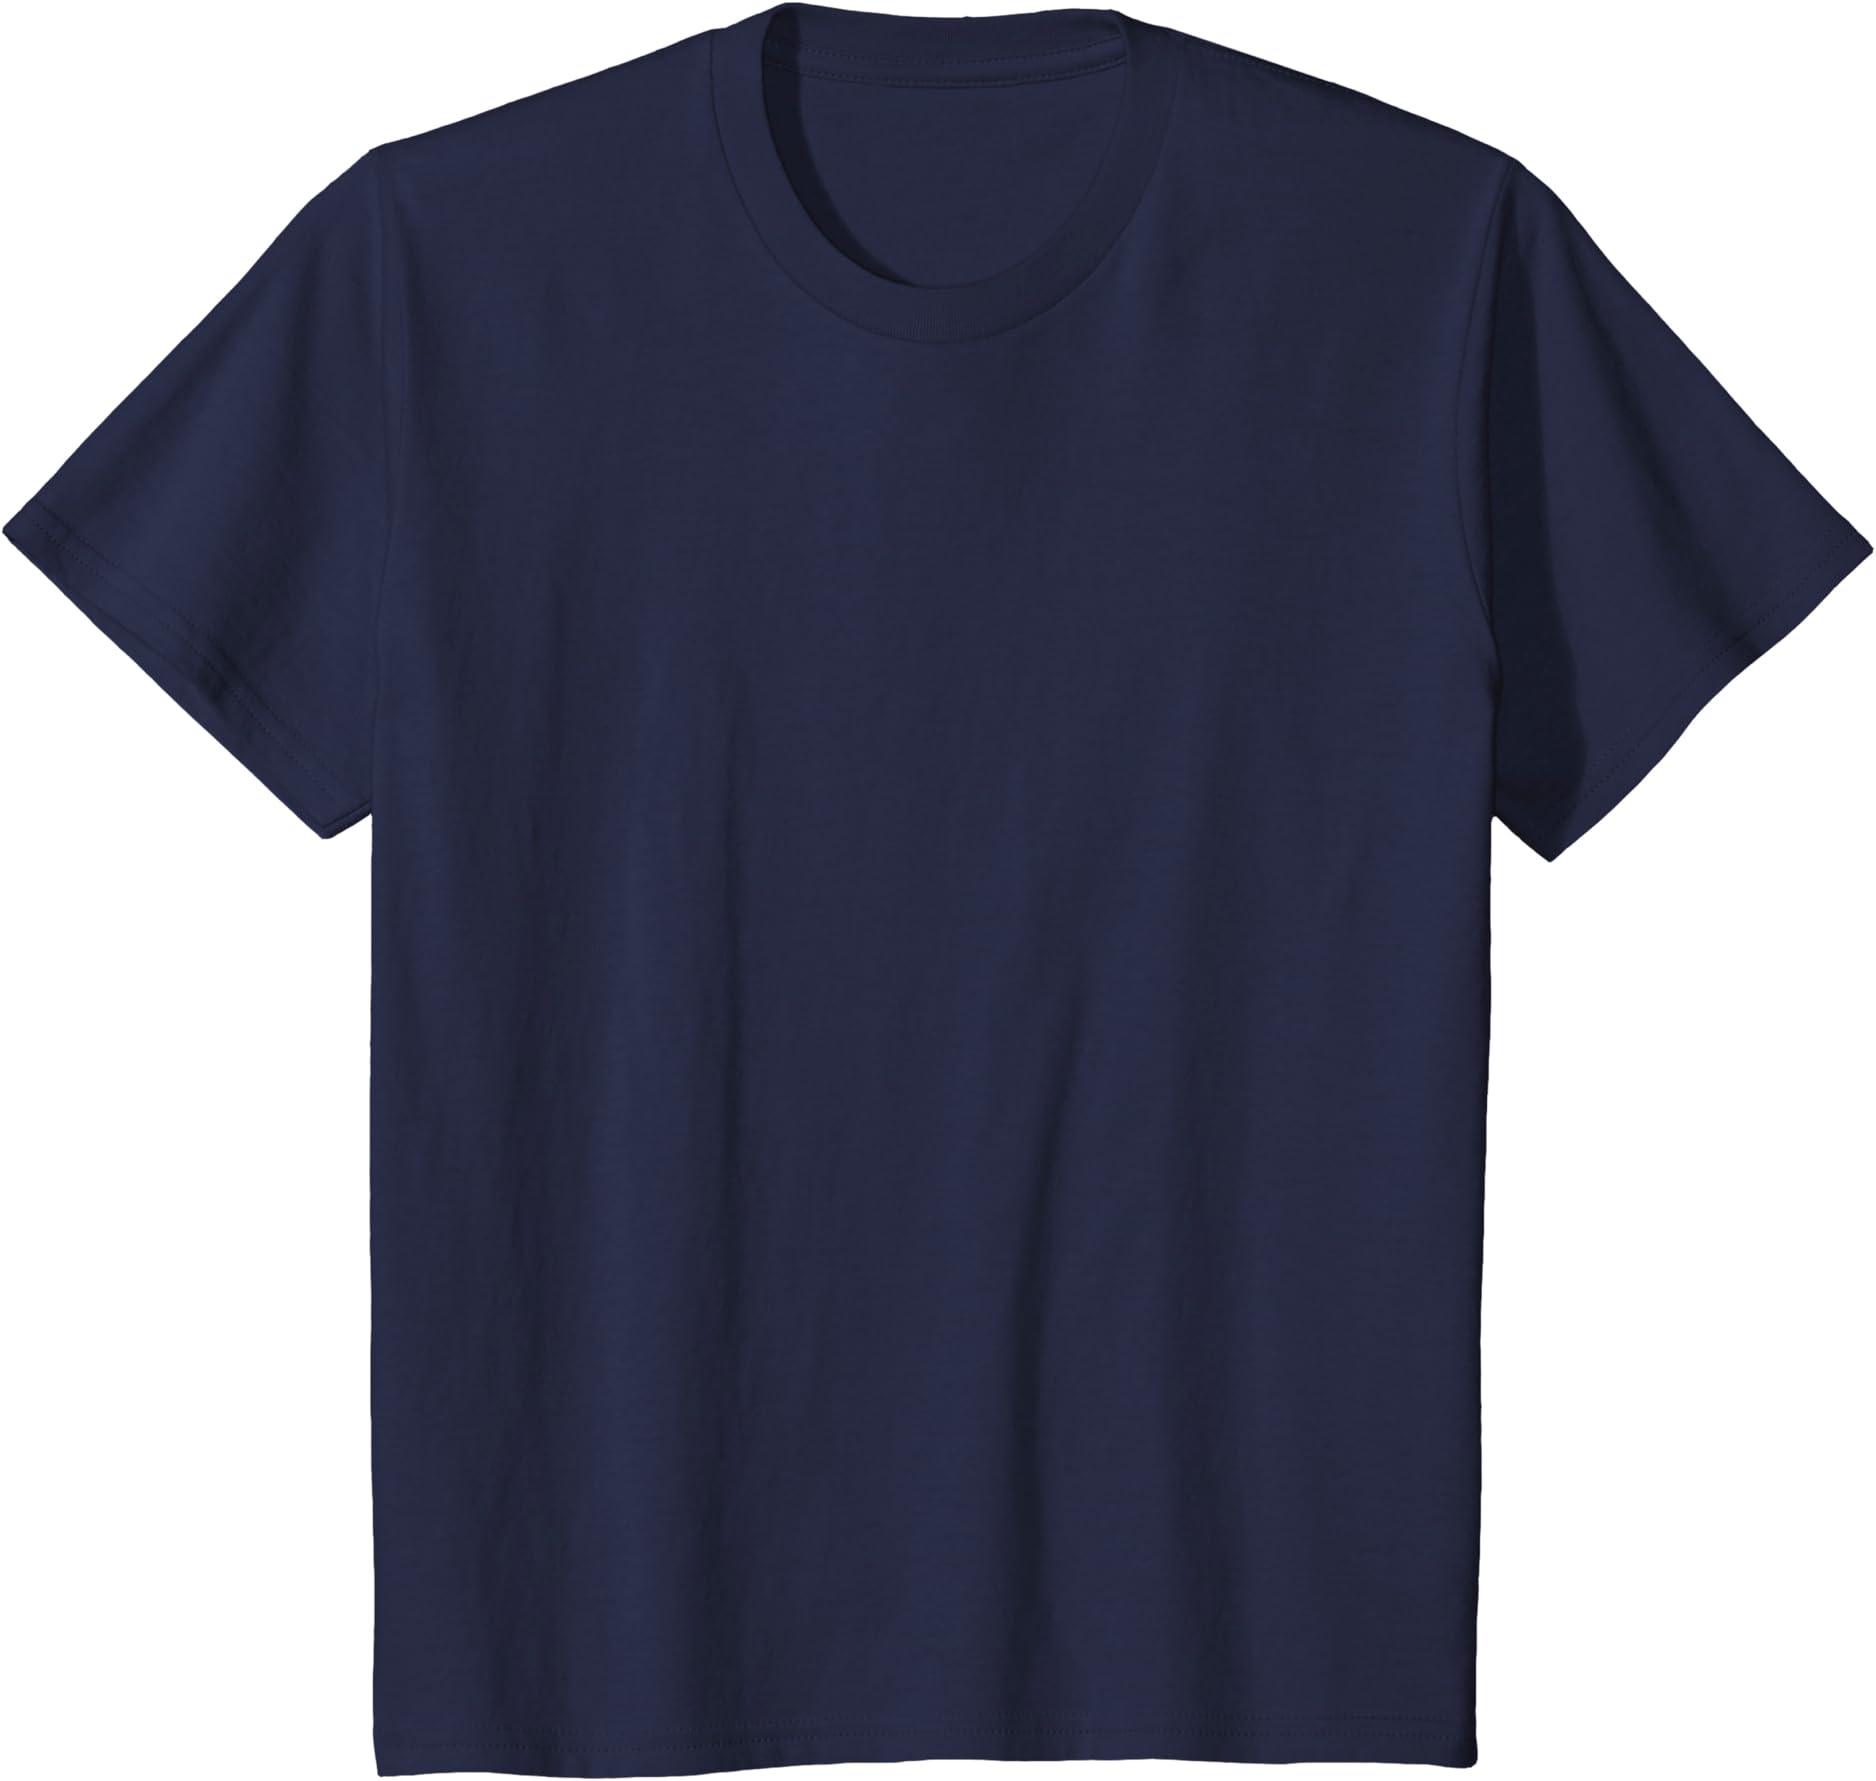 Kids // Childrens T-Shirt Physics Go Science 8 Colours Nerd Scientist